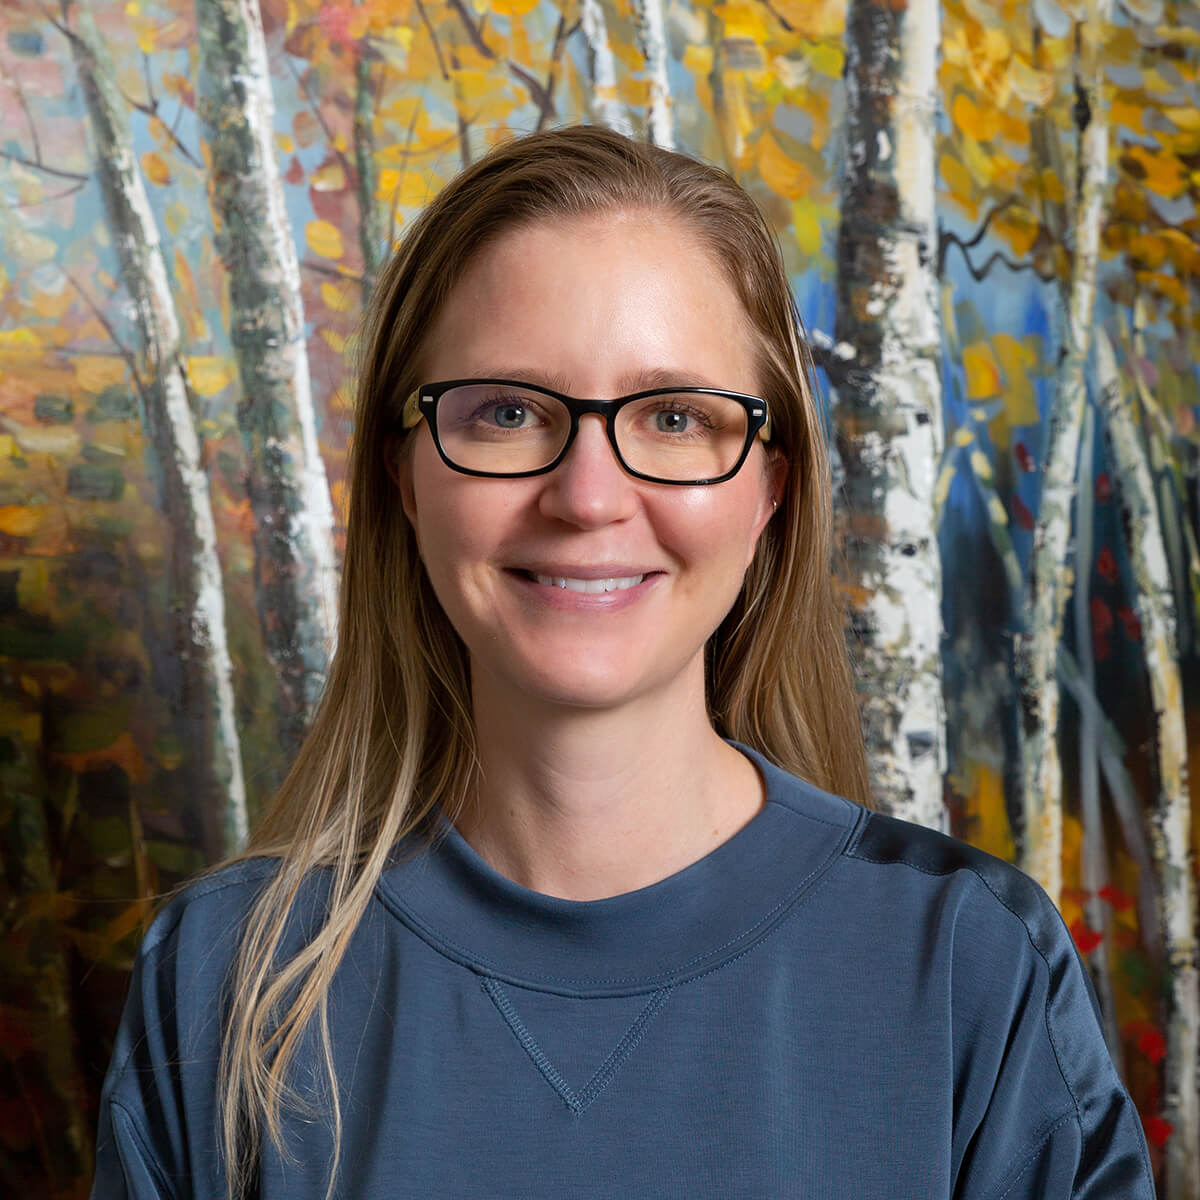 Dr. Laura Stinton